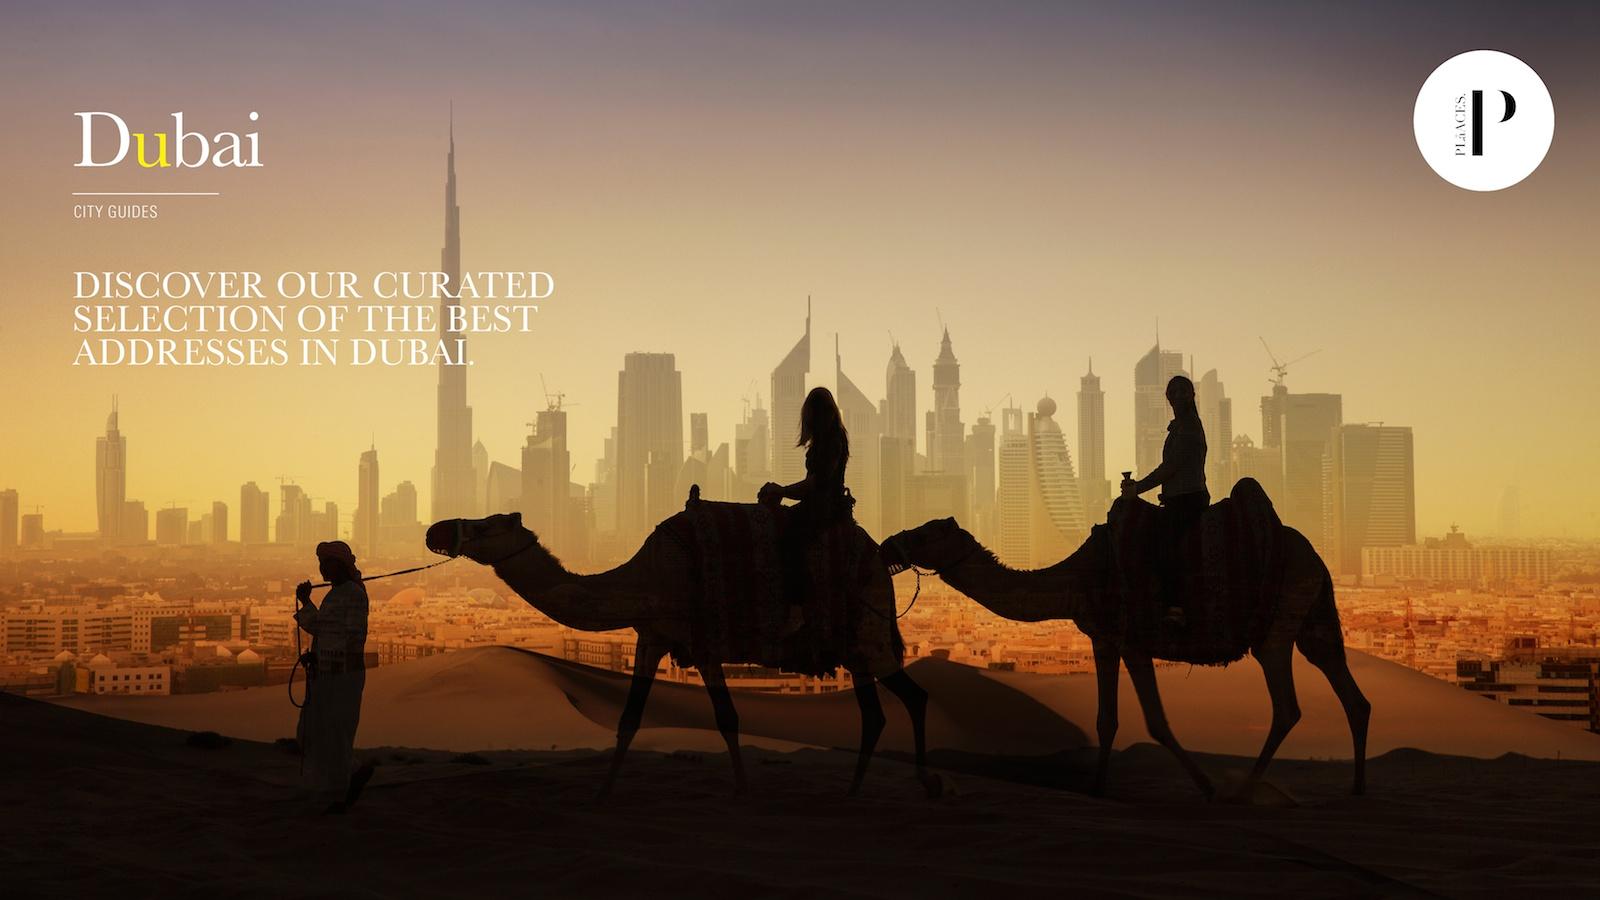 Dubai City Guide Hero Detail 1600x900px.jpg